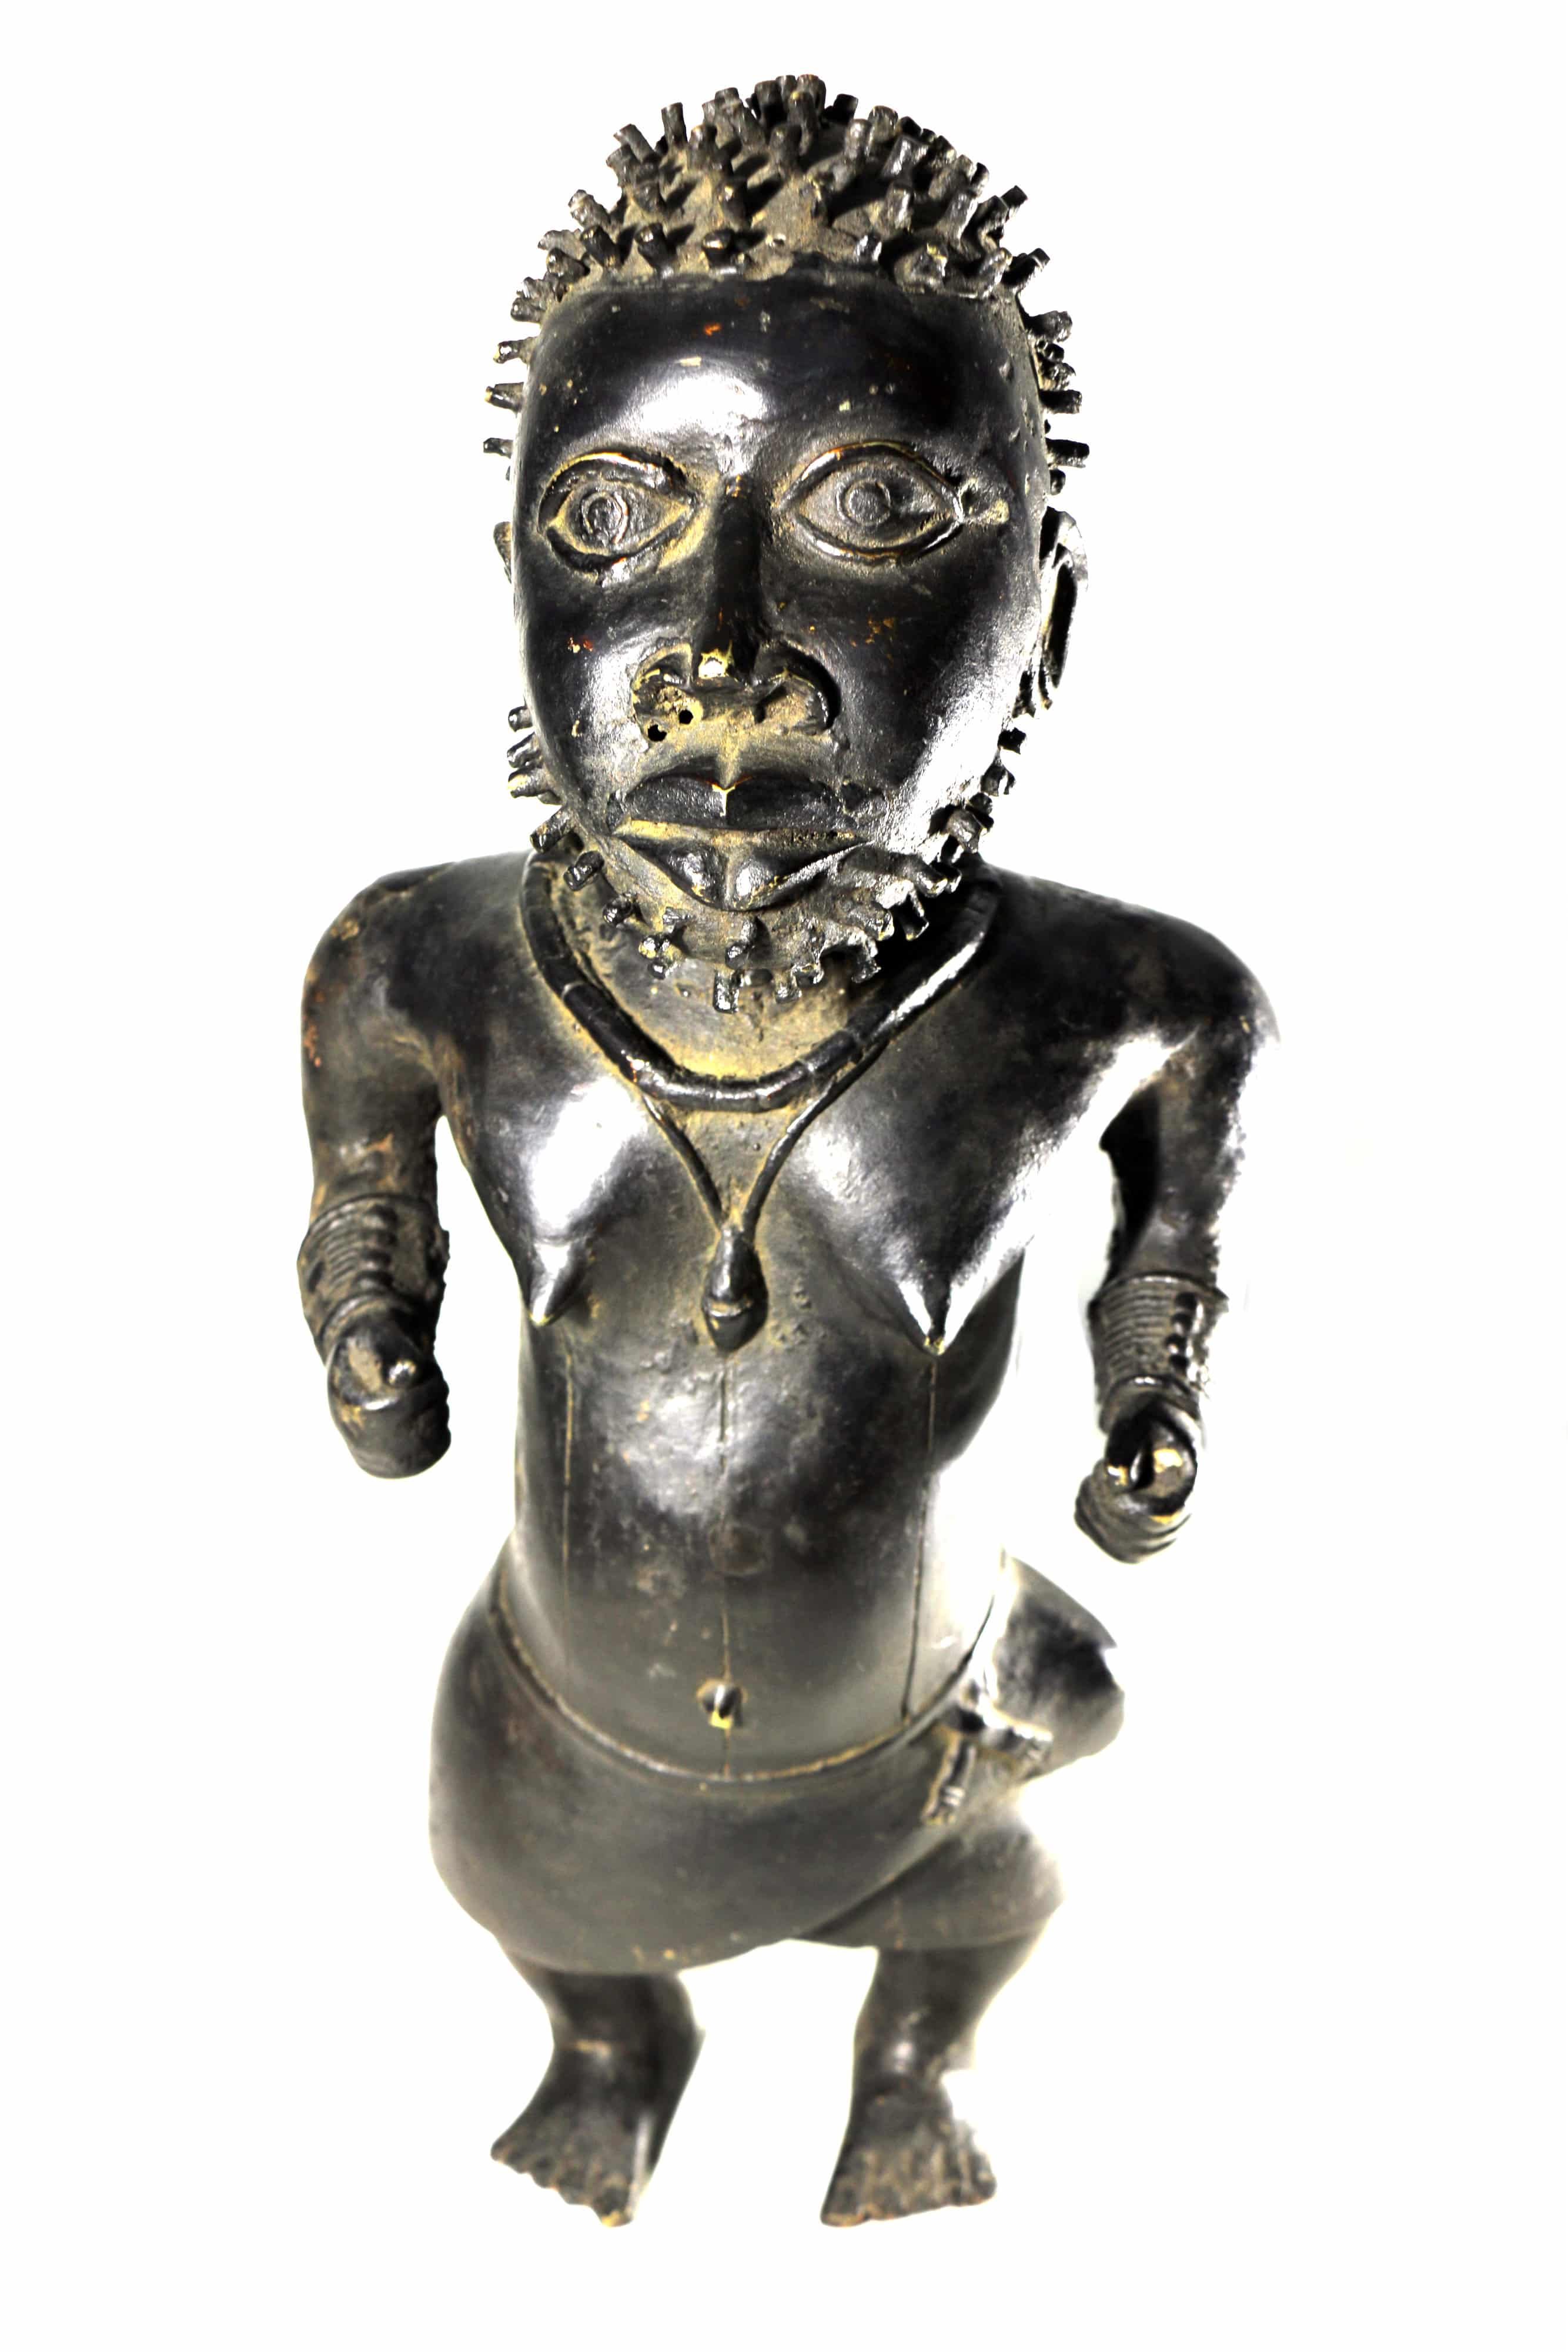 Benin and Nigeria Authentic 19th C Yorubaland West Africa African Yoruba Brass Female figure 19th C